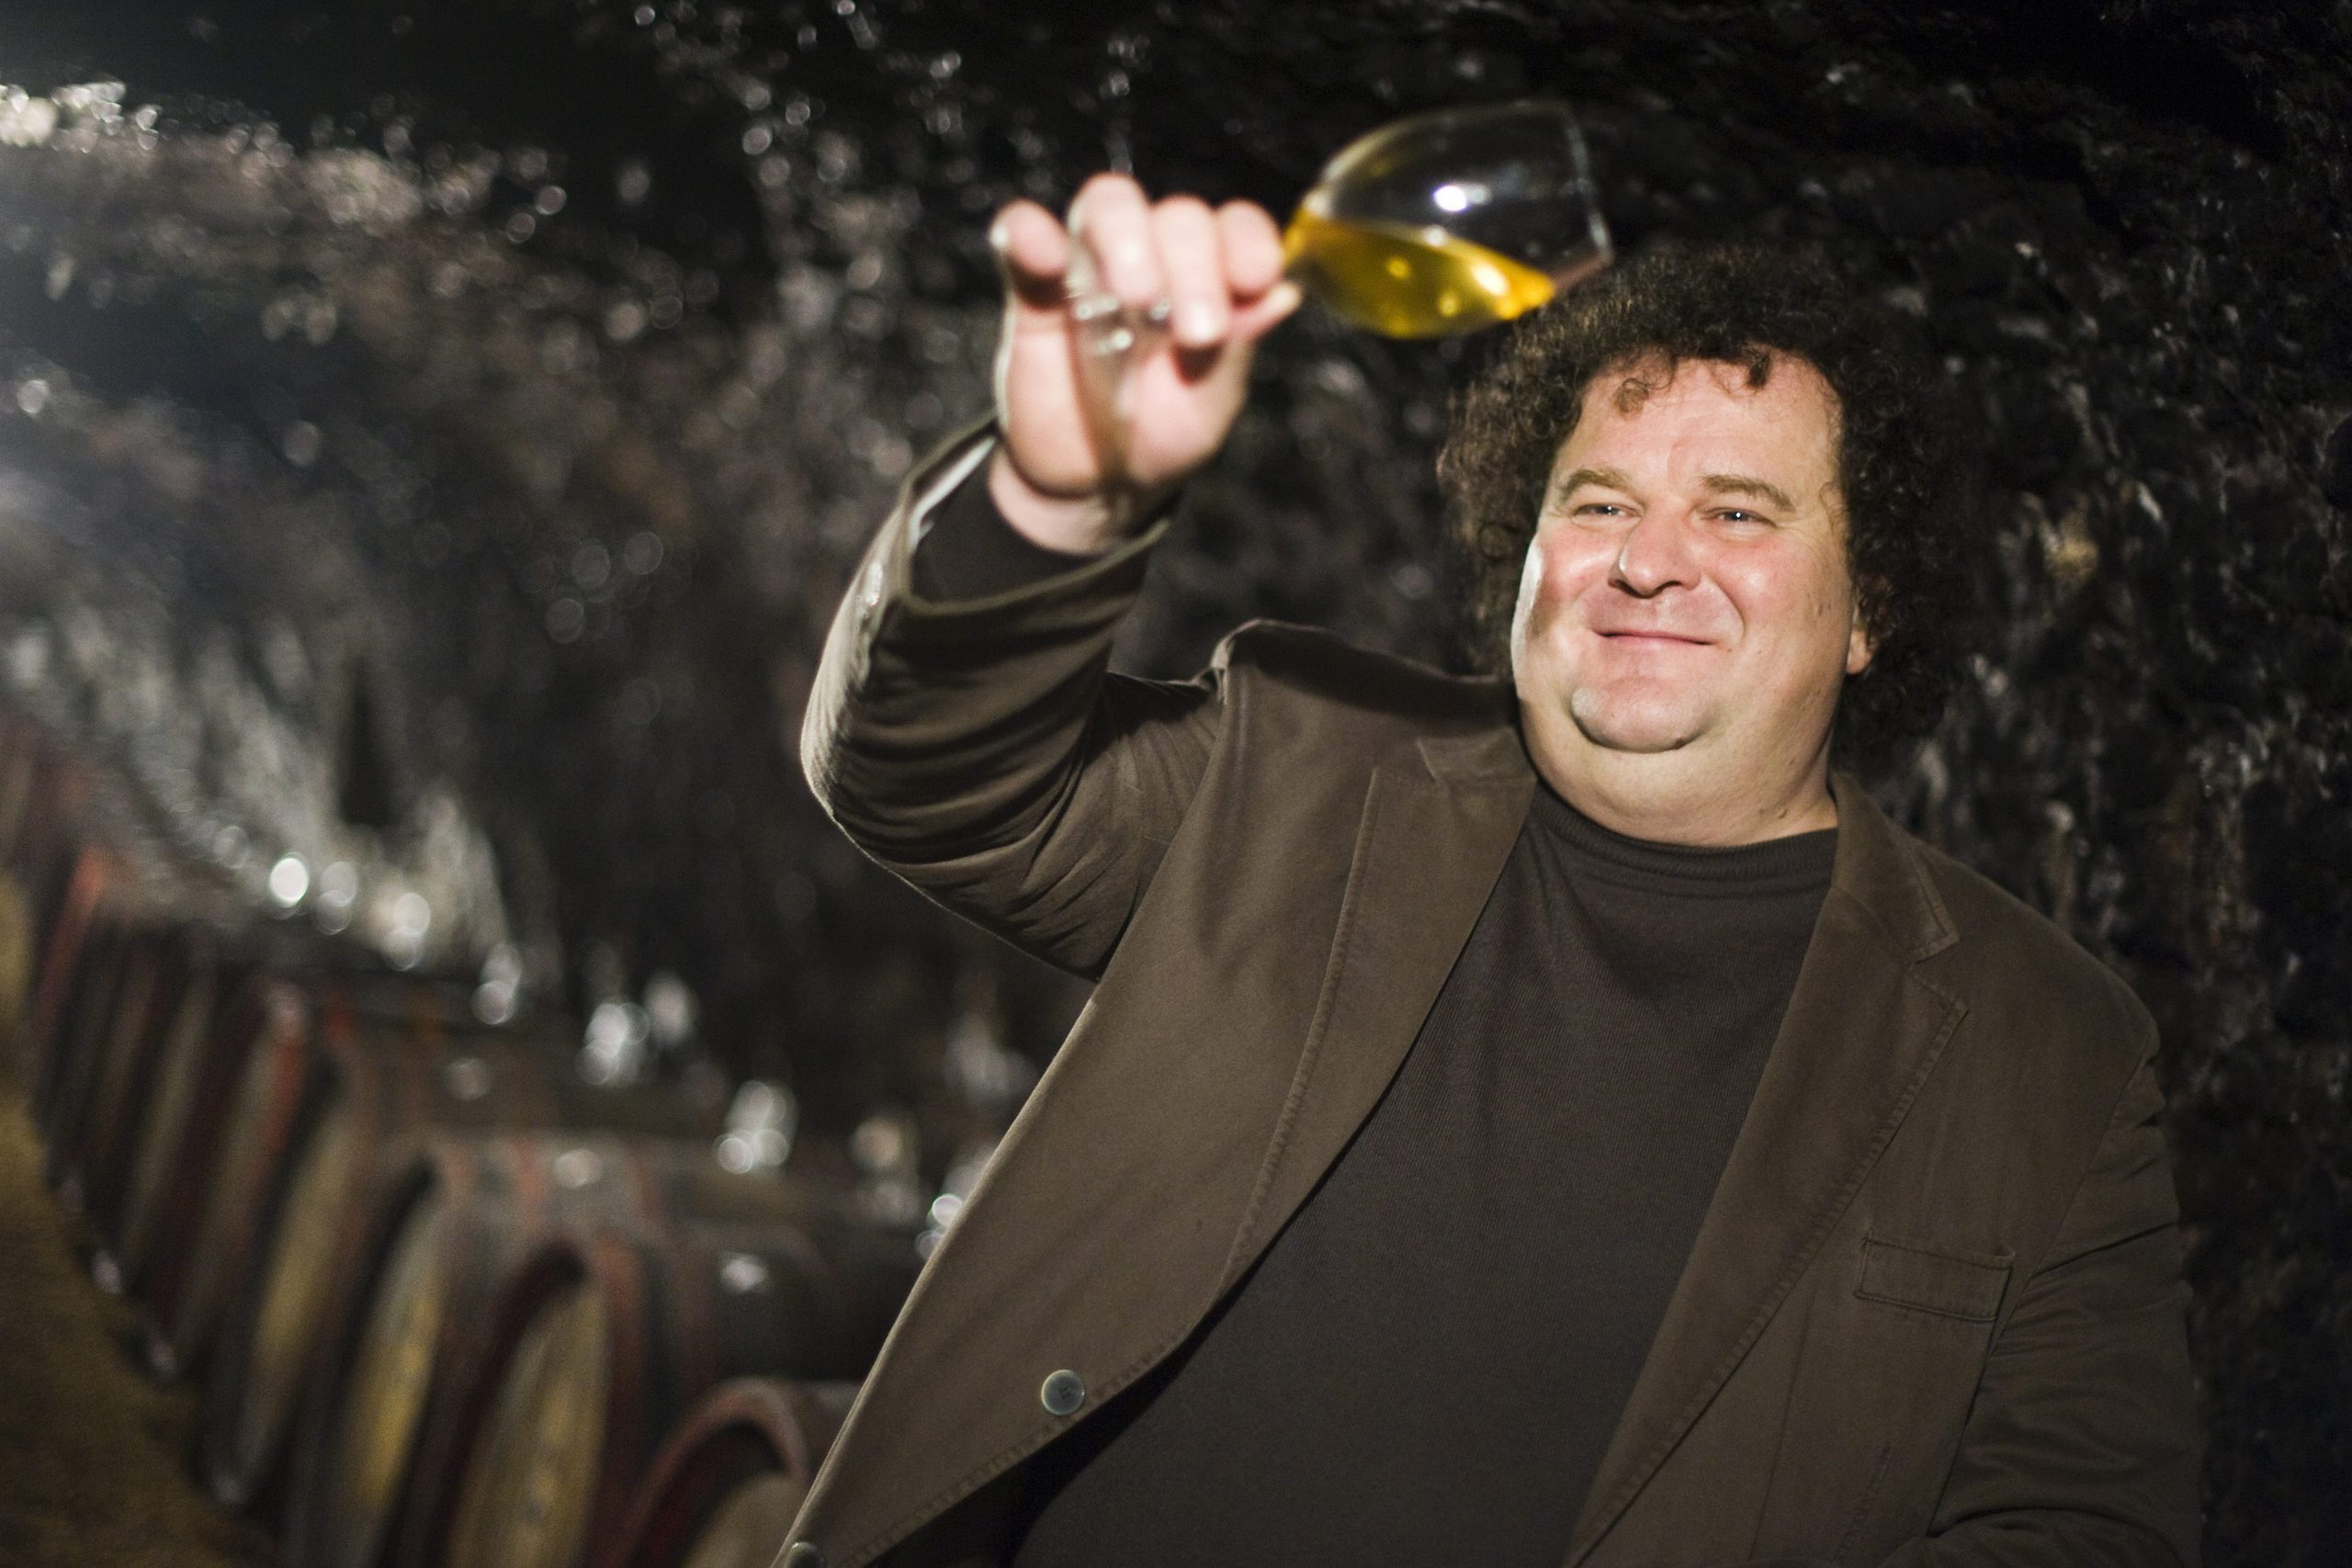 Winemakers Choose Legendary Tokaj Winemaker as Best of This Year post's picture